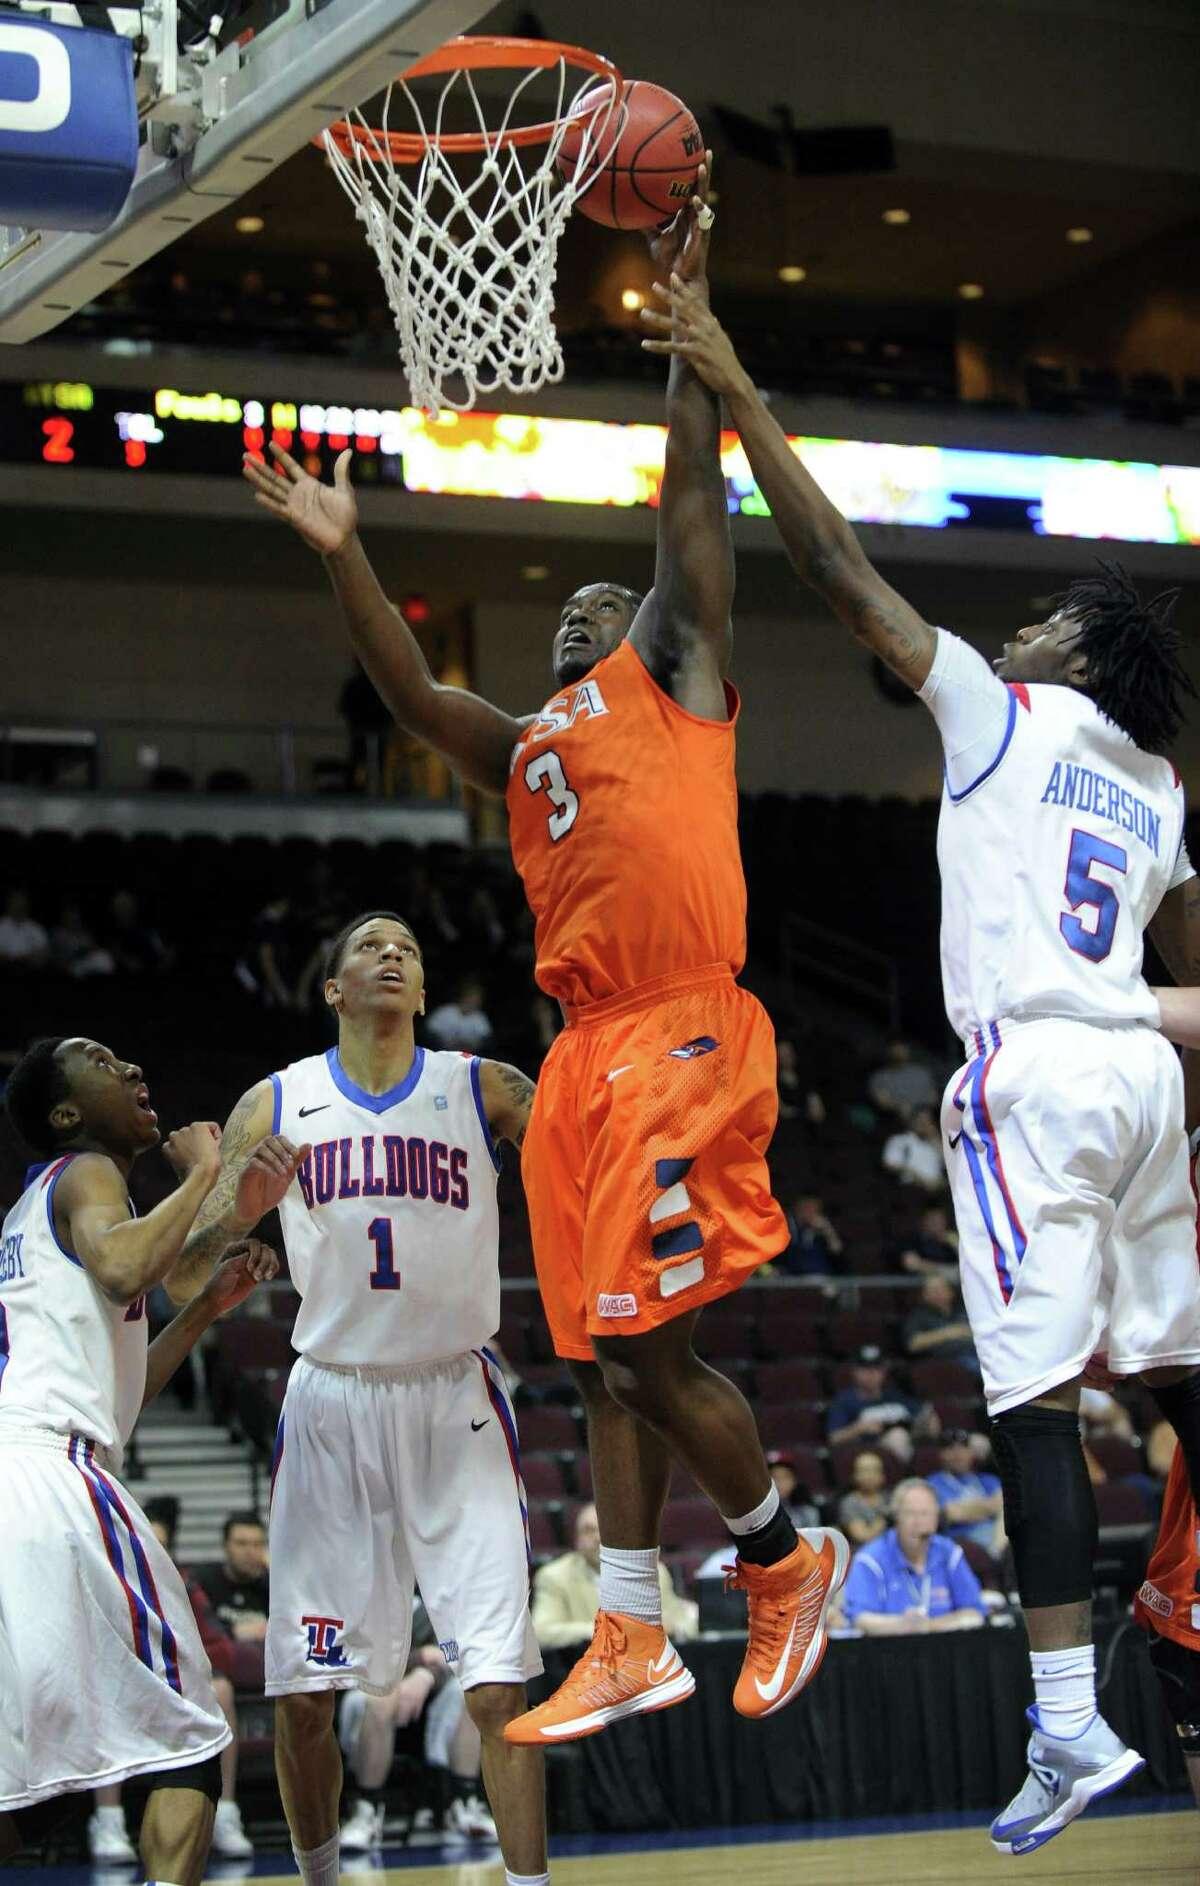 UTSA's Larry Wilkins shoots against Louisiana Tech's Chris Anderson (right) on Thursday in Las Vegas.